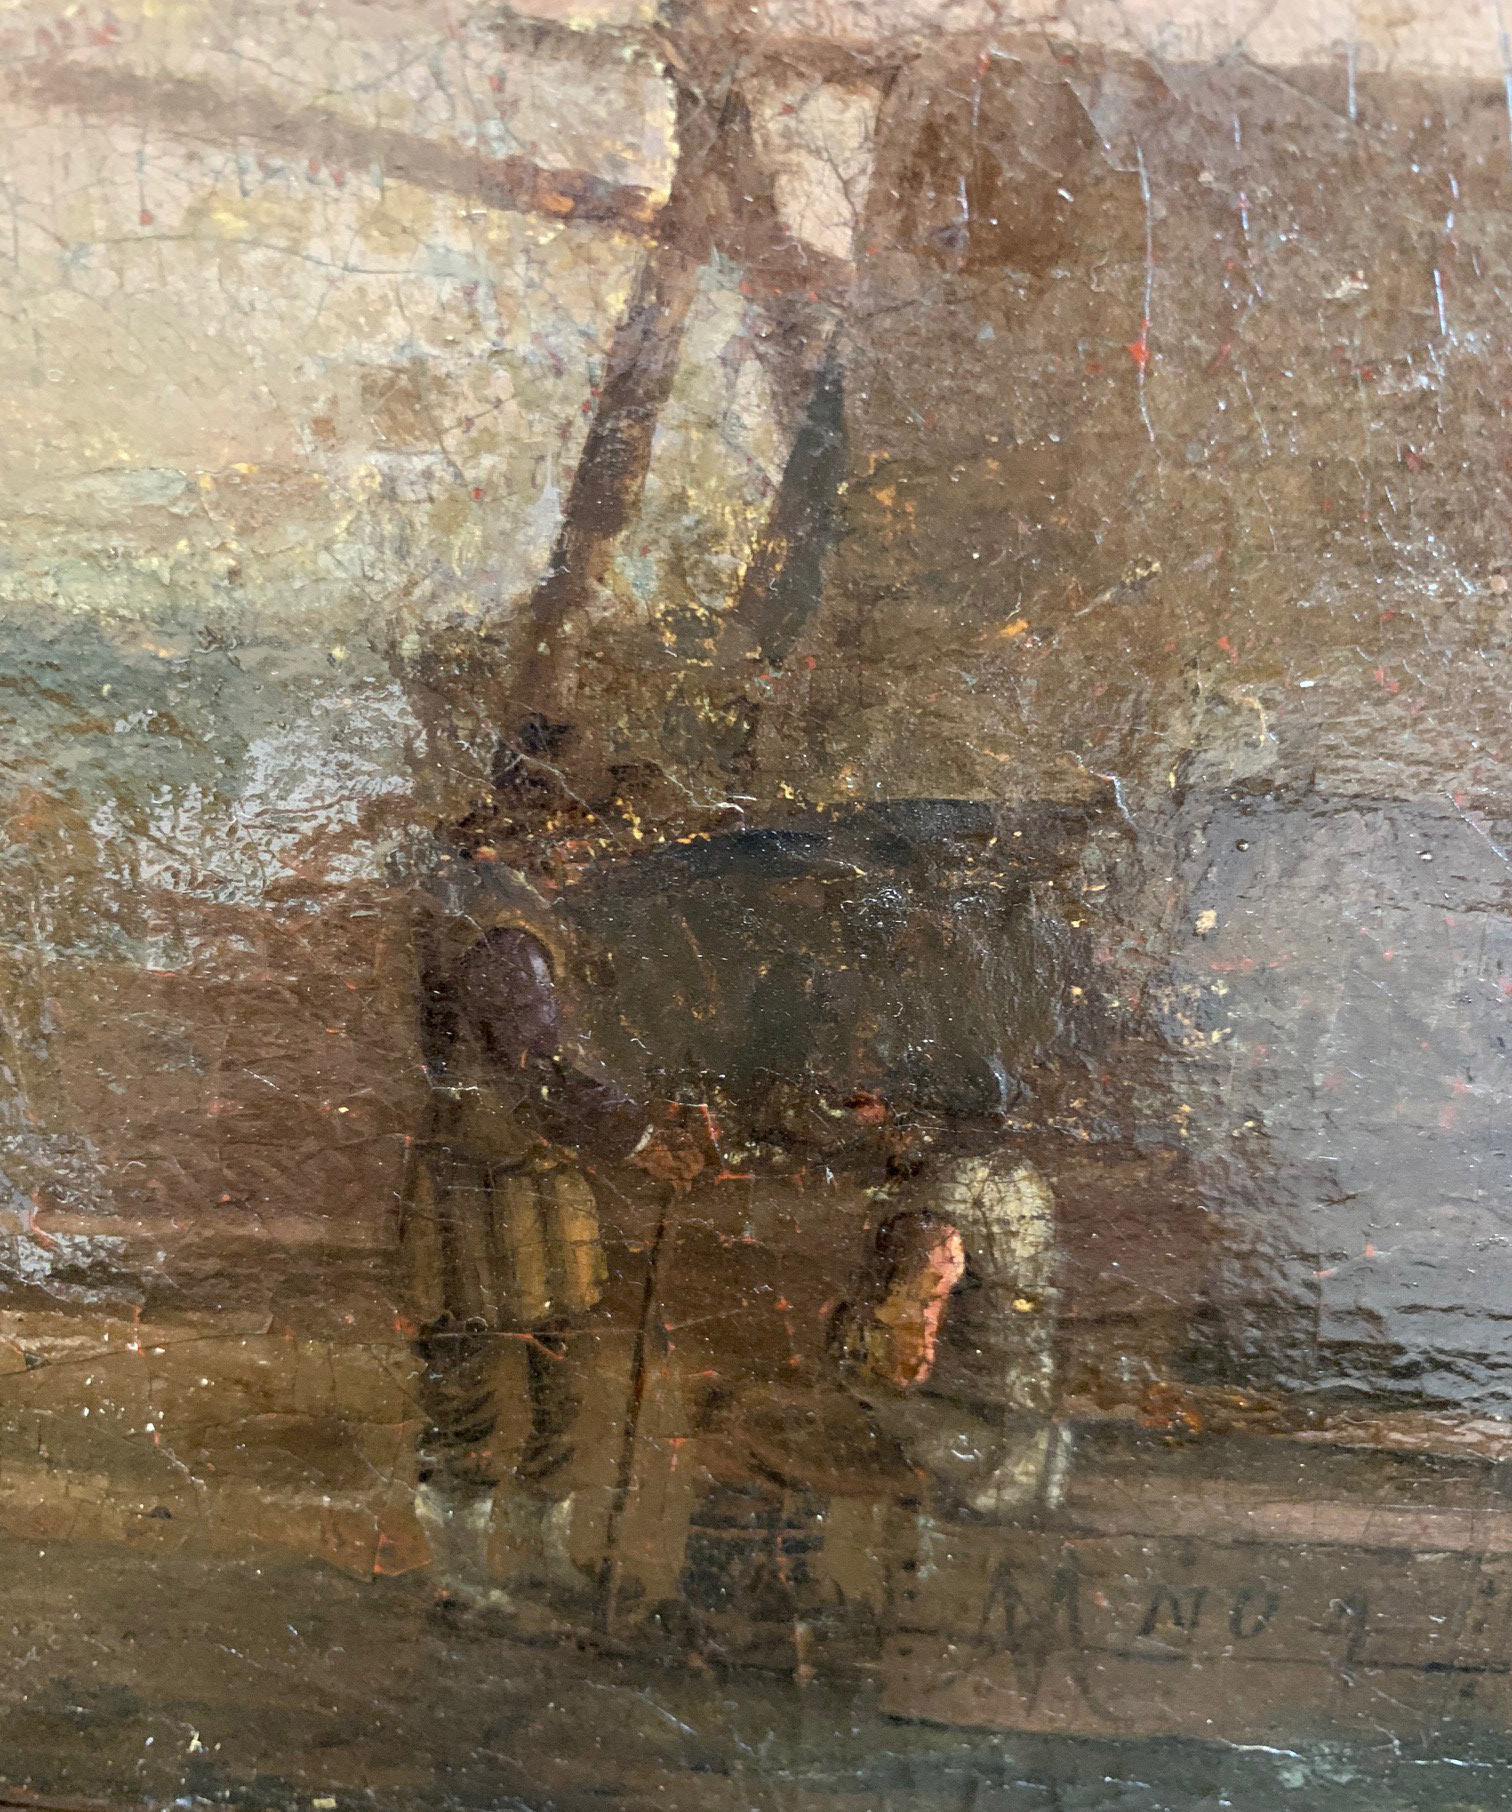 CIRCLE OF JAN VAN GOYEN, LEIDEN, 1596 - 1656, THE HAGUE, 17TH CENTURY OIL ON CANVAS River landscape, - Image 8 of 12